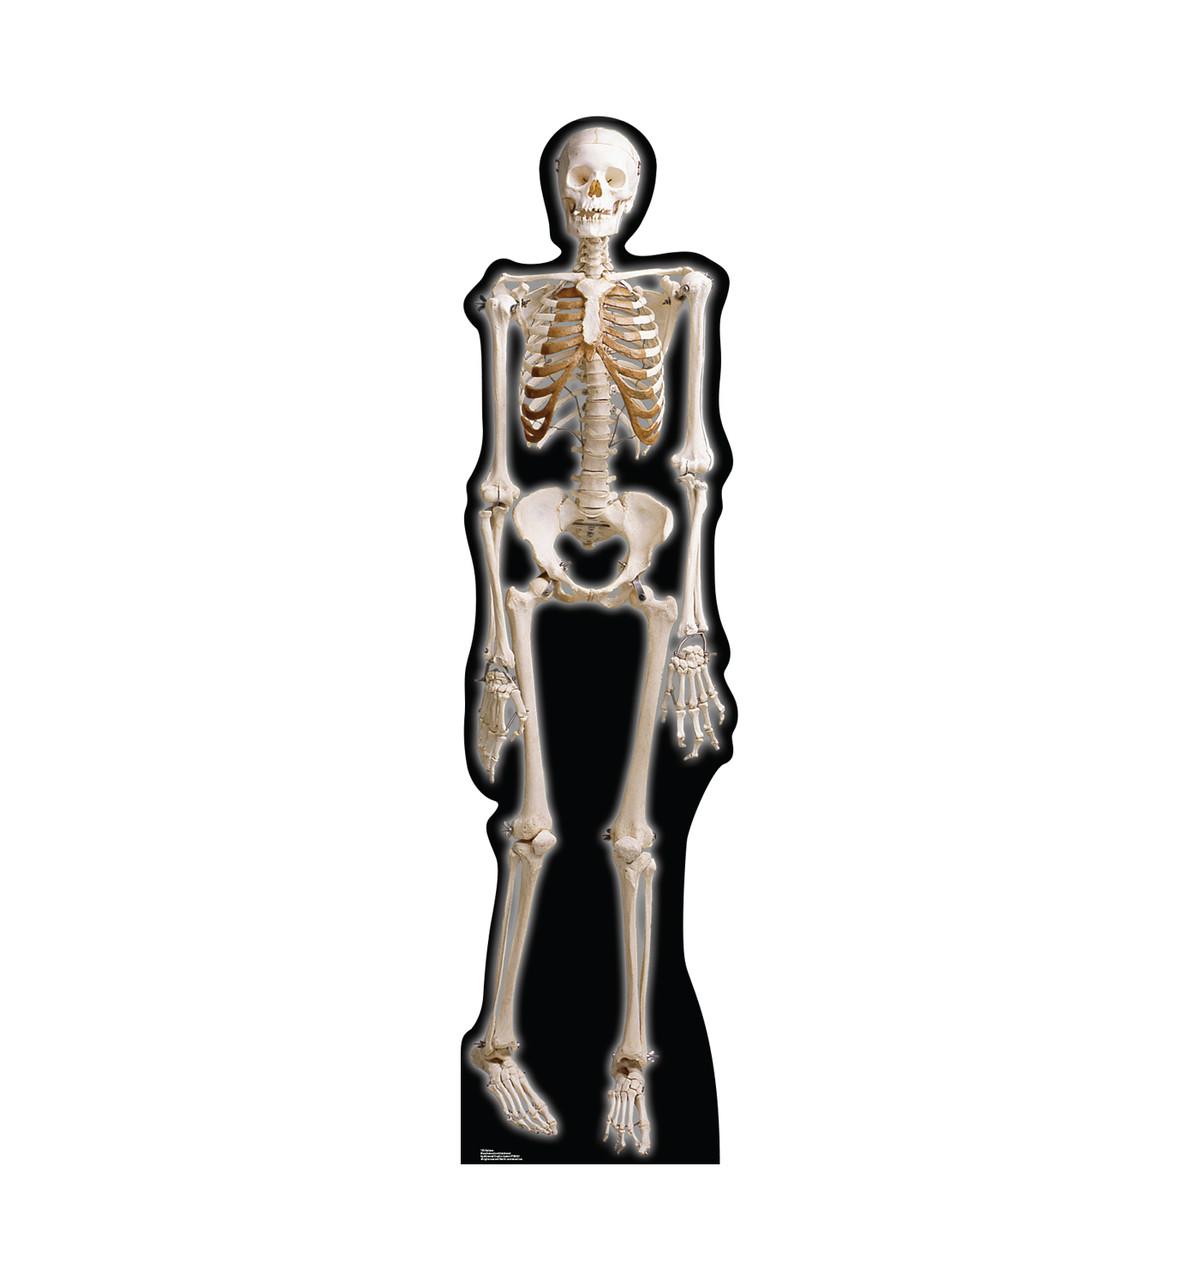 Life-size The Skeleton Cardboard Standup.